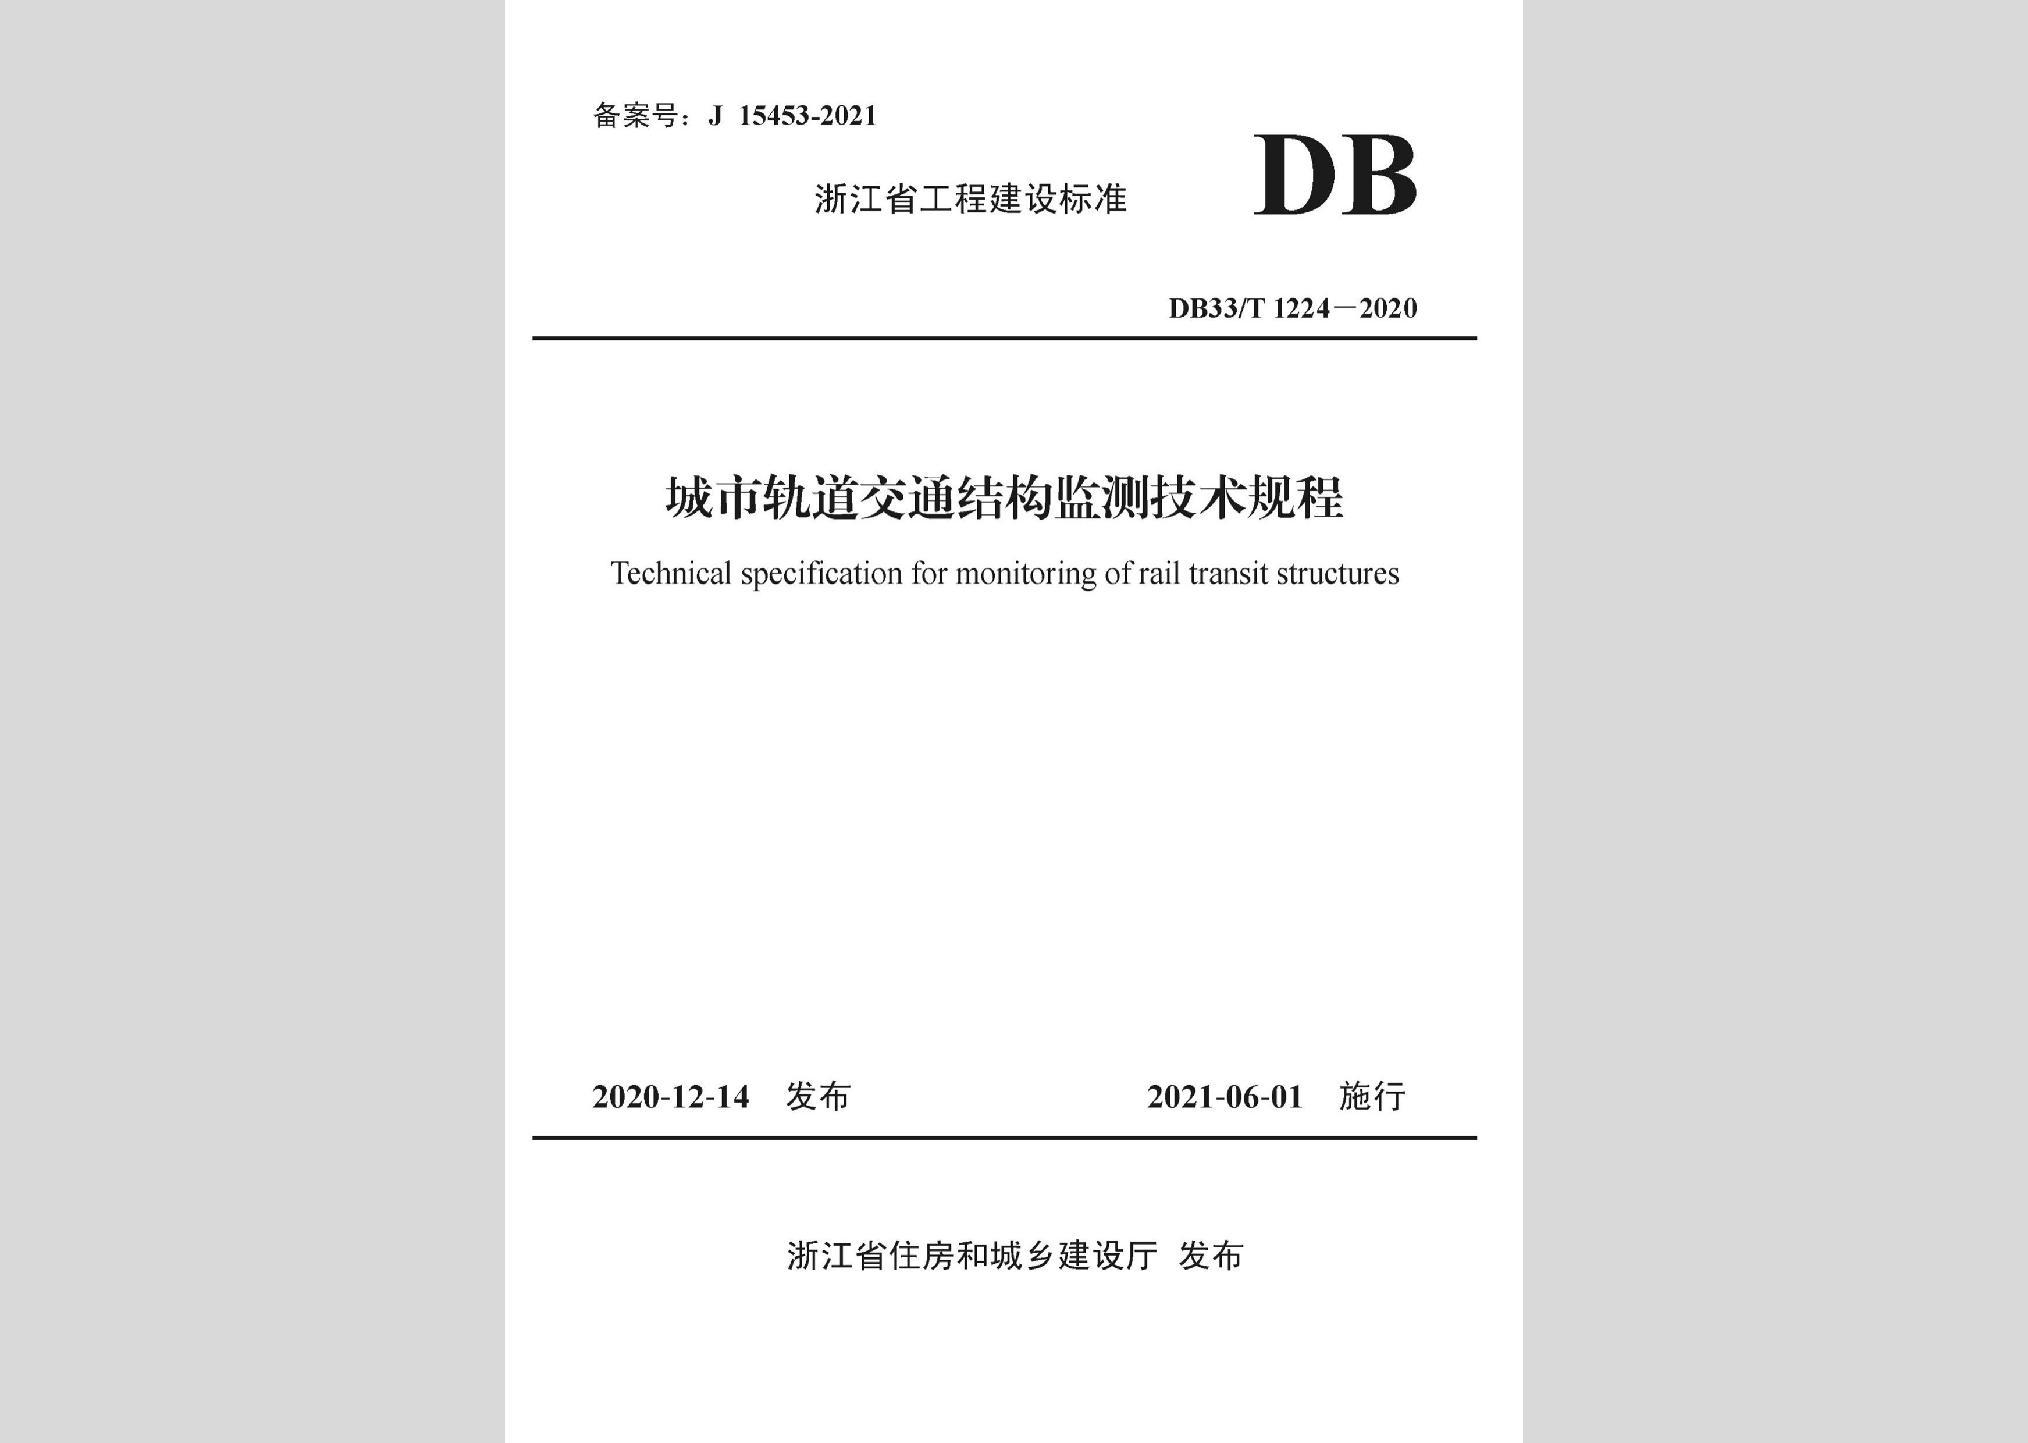 DB33/T1224-2020:城市轨道交通结构监测技术规程